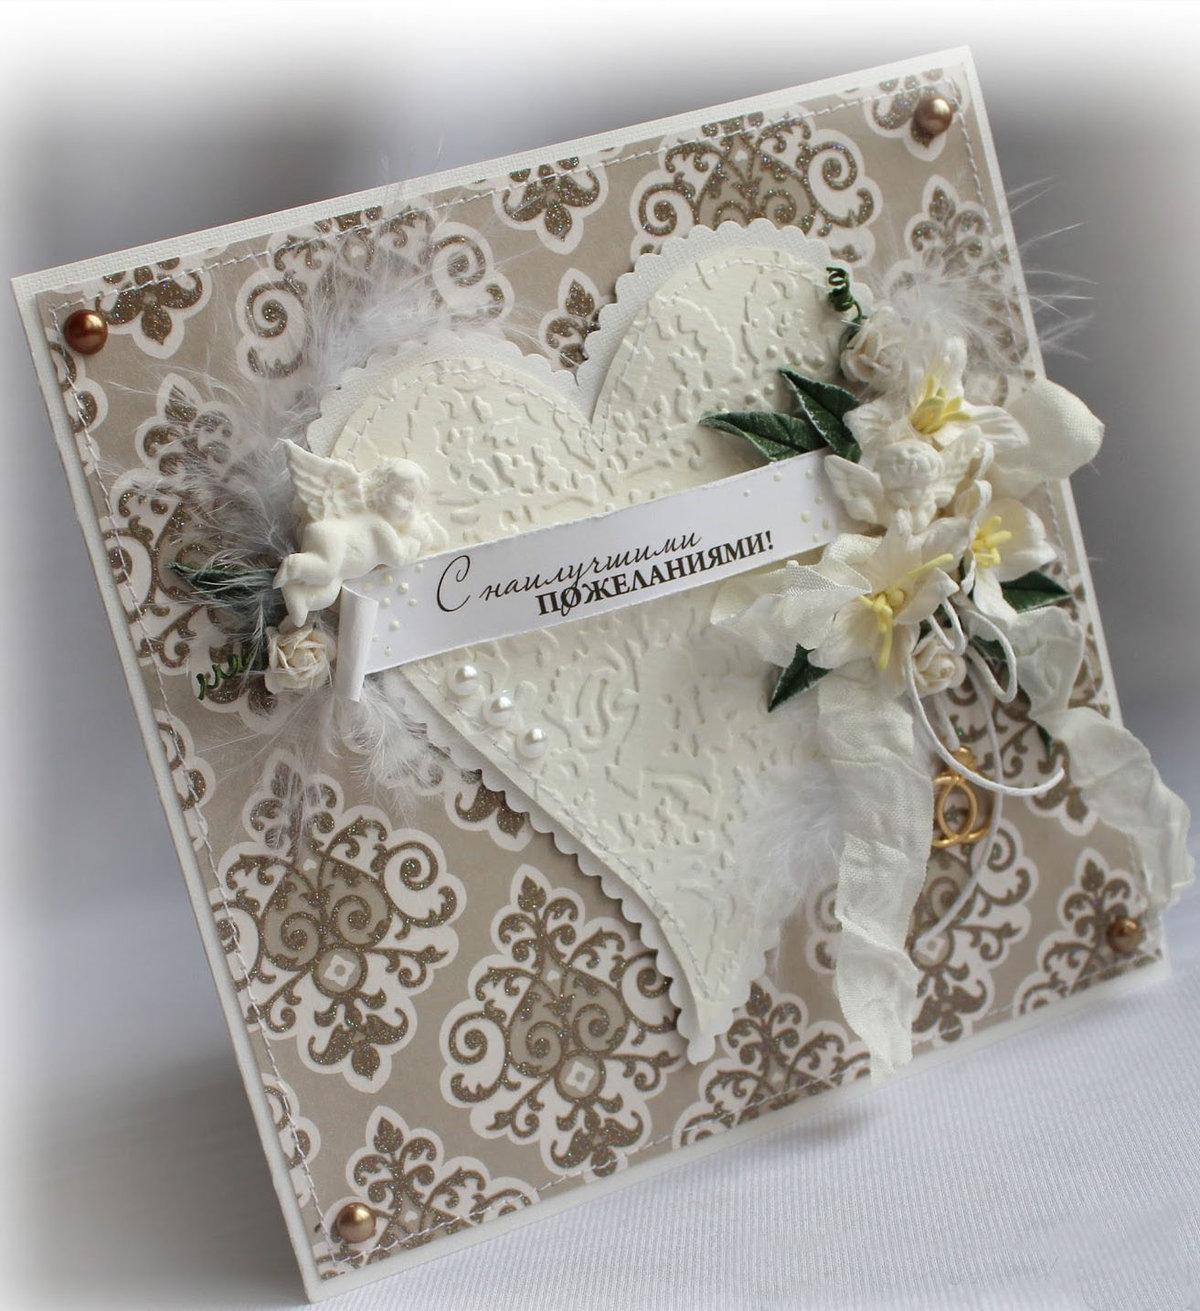 Открытки на свадьбу с фото молодоженов, детскими руками